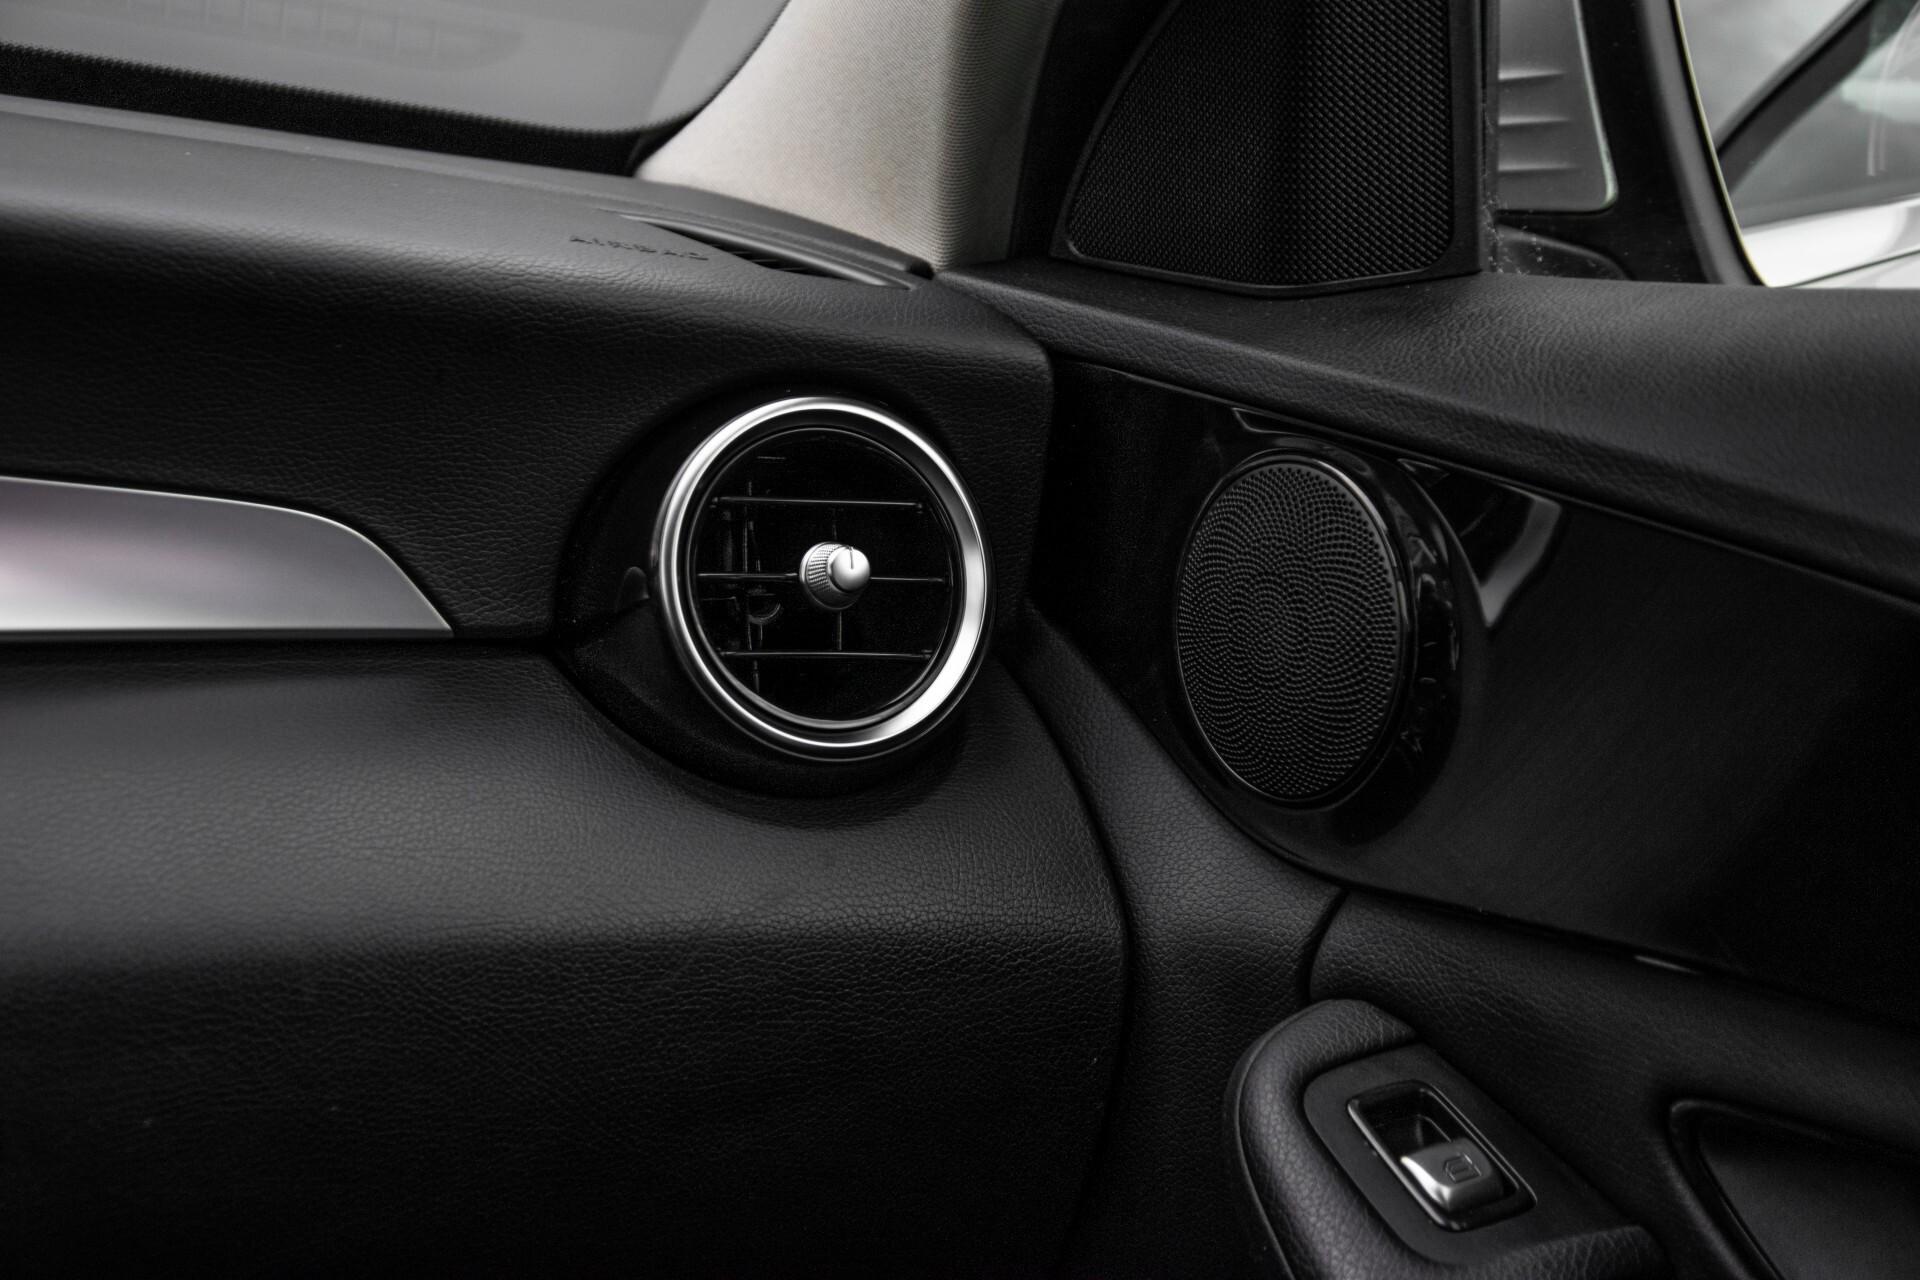 Mercedes-Benz C-Klasse 180 Bluetec Lease Edition Intelligent Light System/Cruise Control/Navi Foto 37